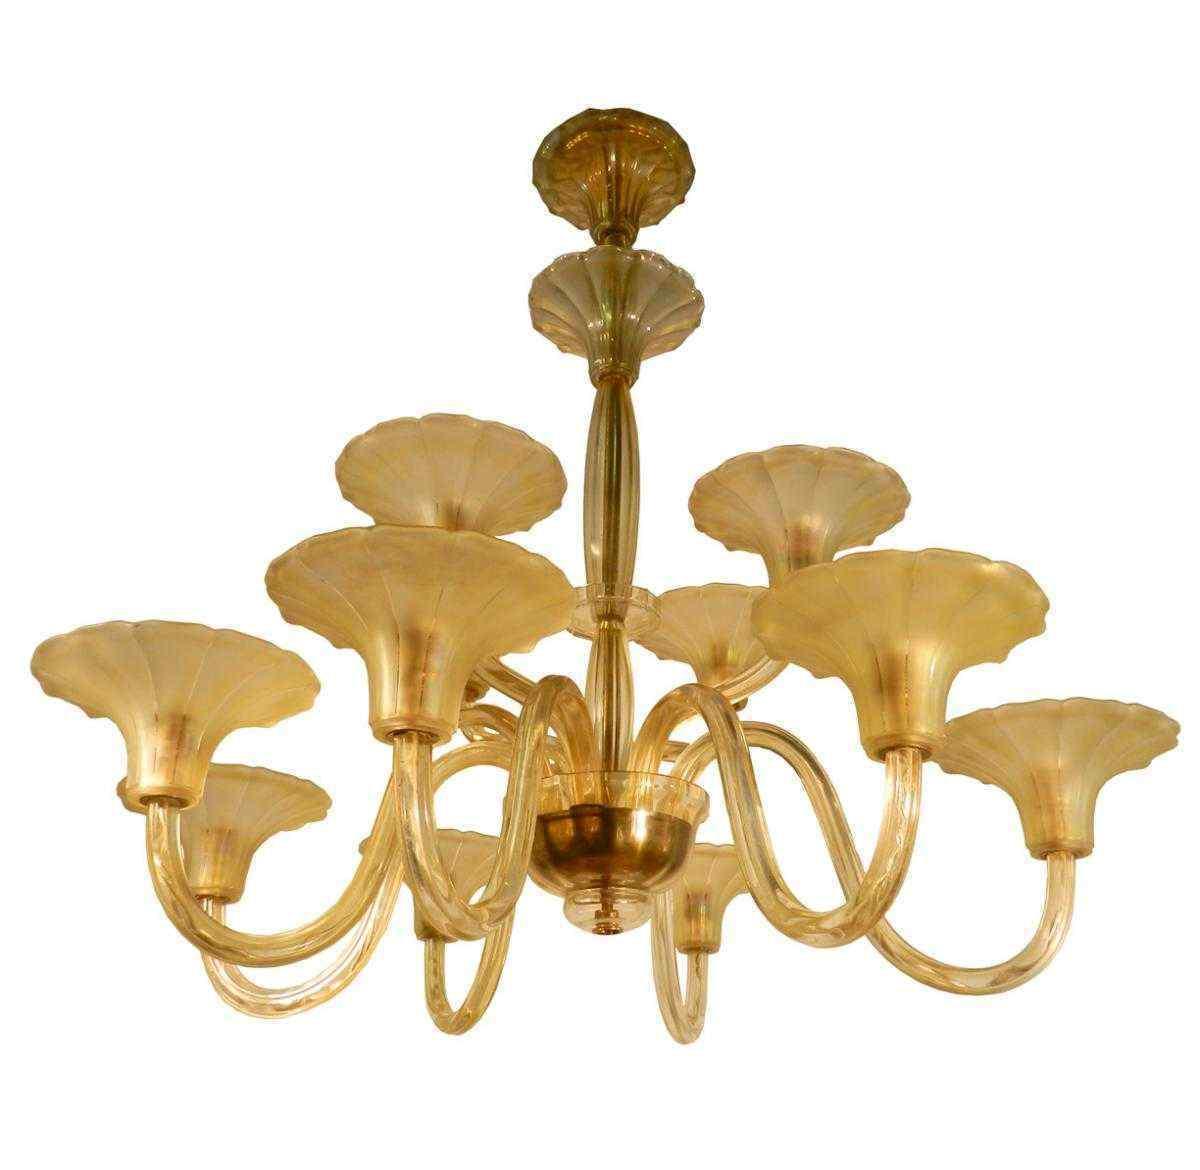 lustre poque art deco a 12 branches verre jaune anticswiss. Black Bedroom Furniture Sets. Home Design Ideas